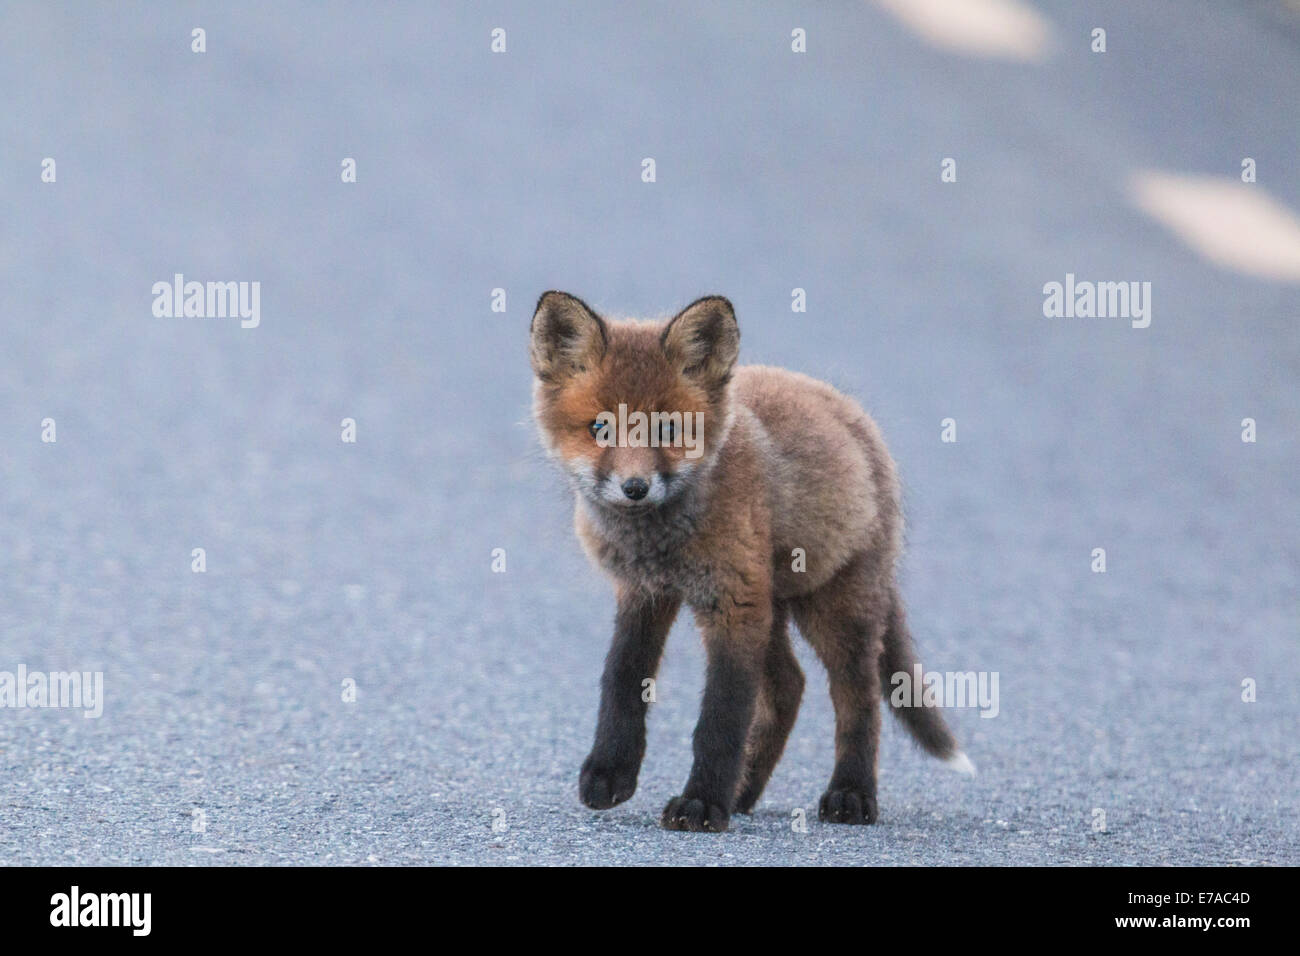 Redfox puppy walking on road in Gällivare swedish lapland - Stock Image